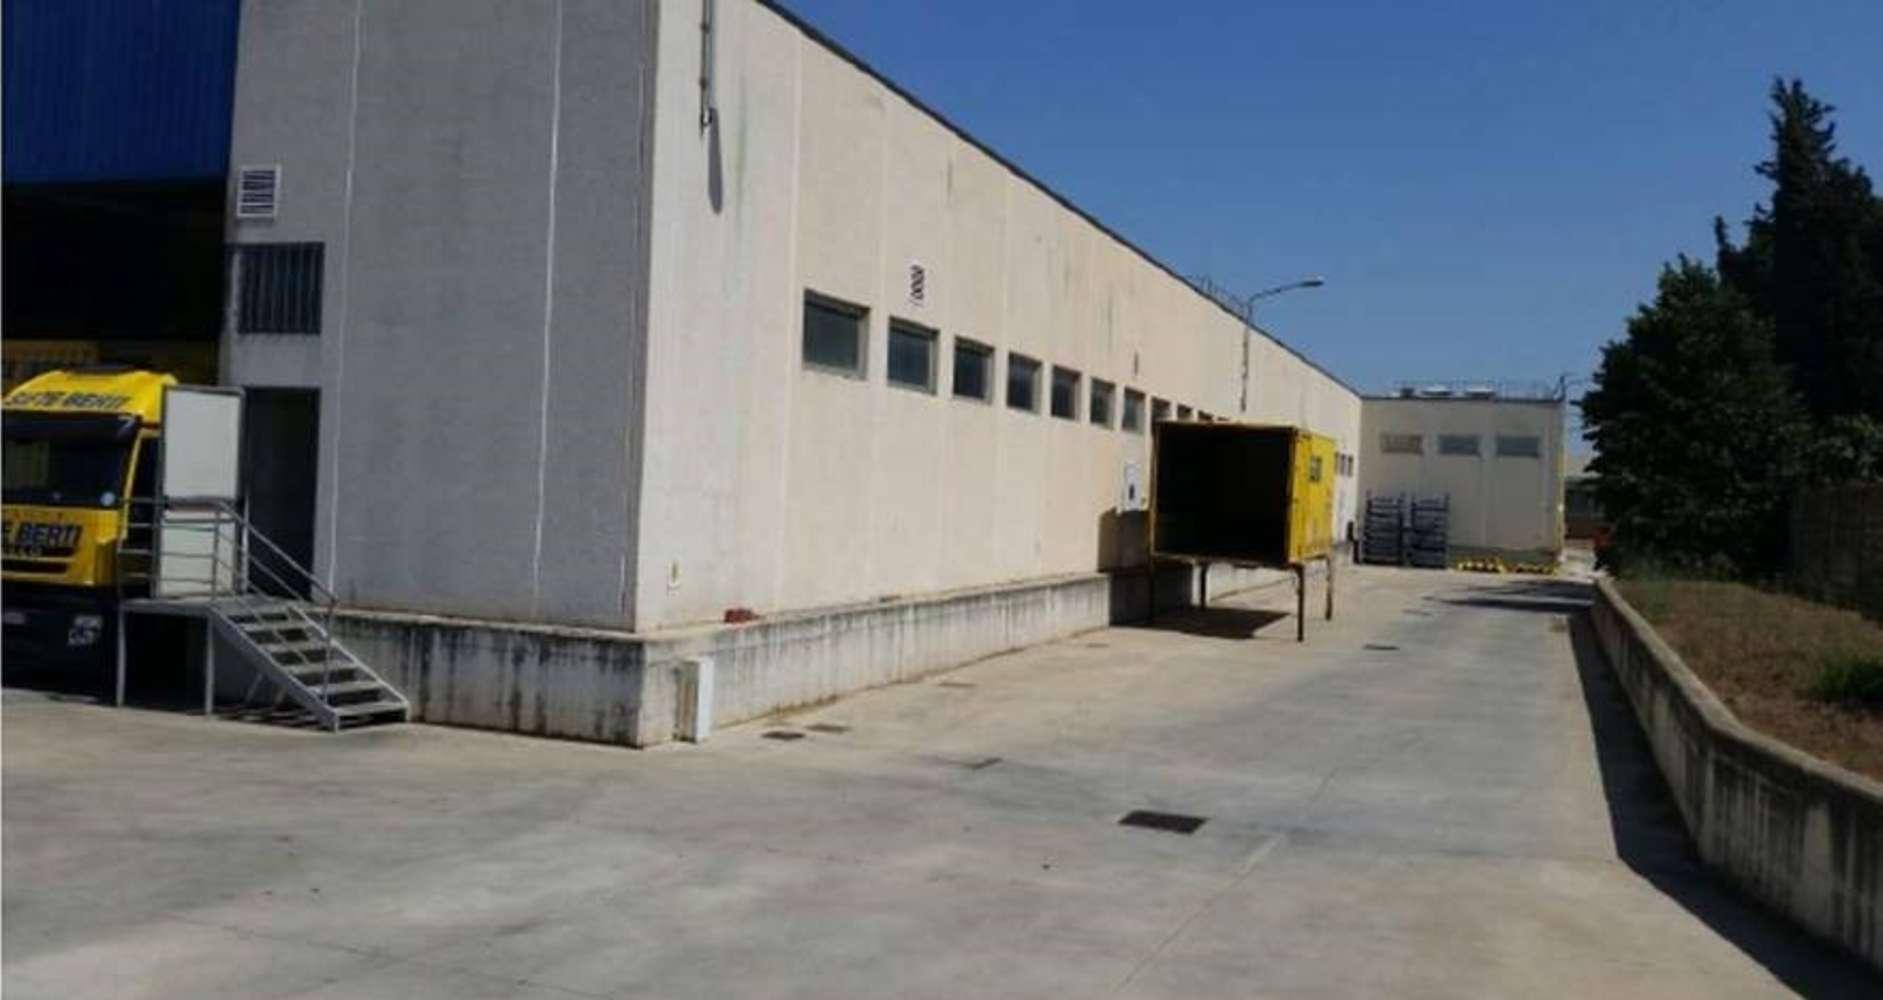 Magazzini industriali e logistici Pomezia, 00040 - Immobile Logistico Pomezia - 10913499